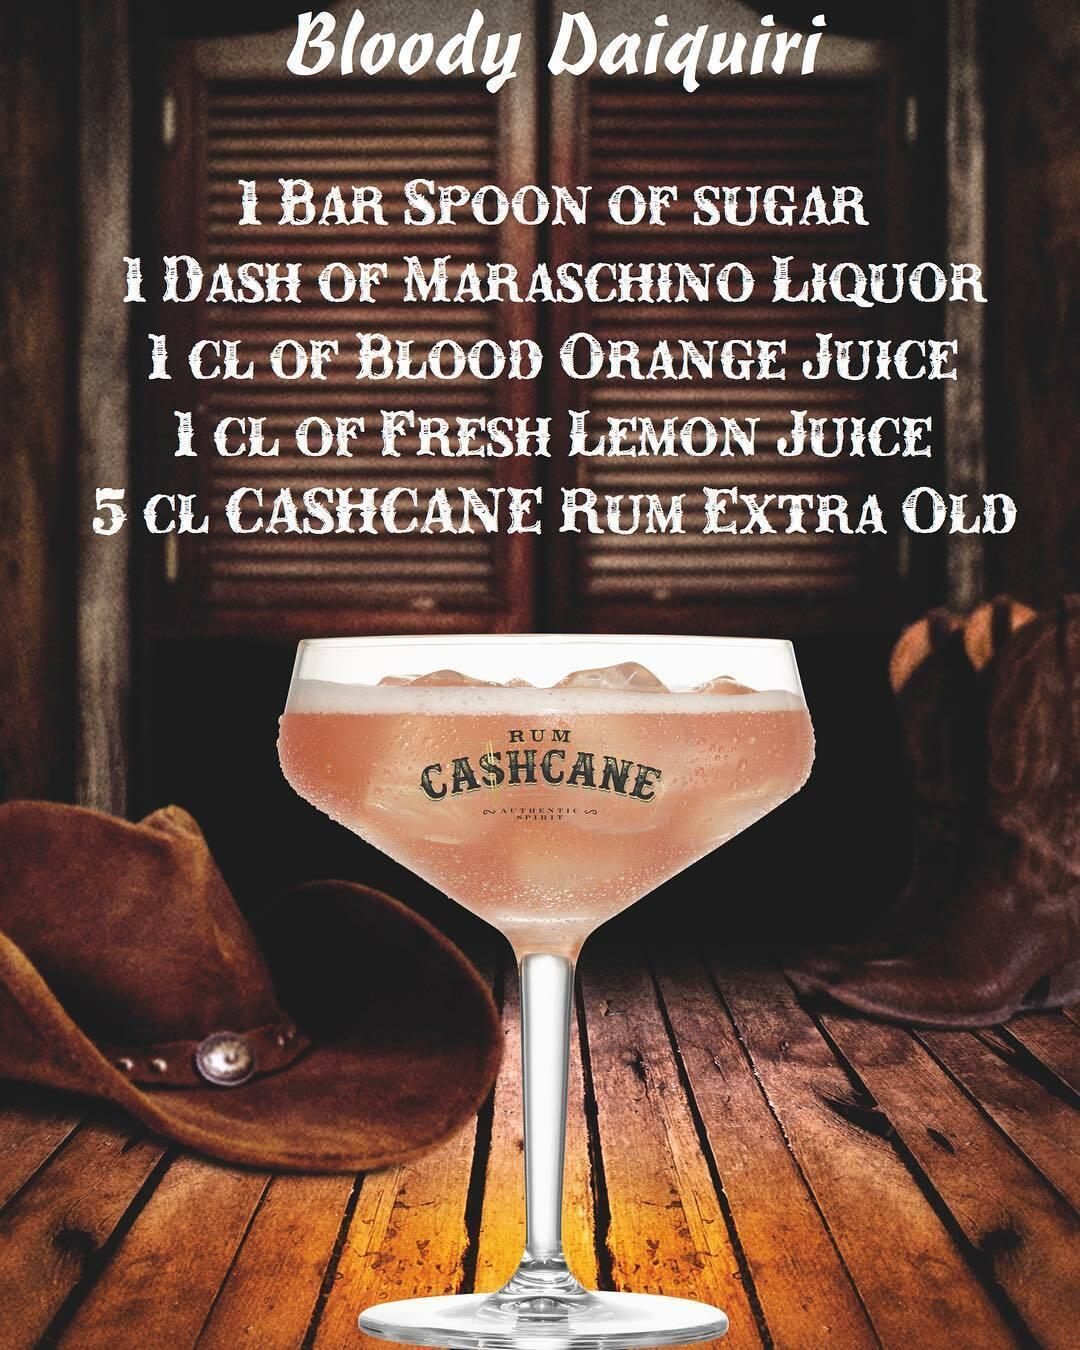 Bloody Daiquiri - XO Drink